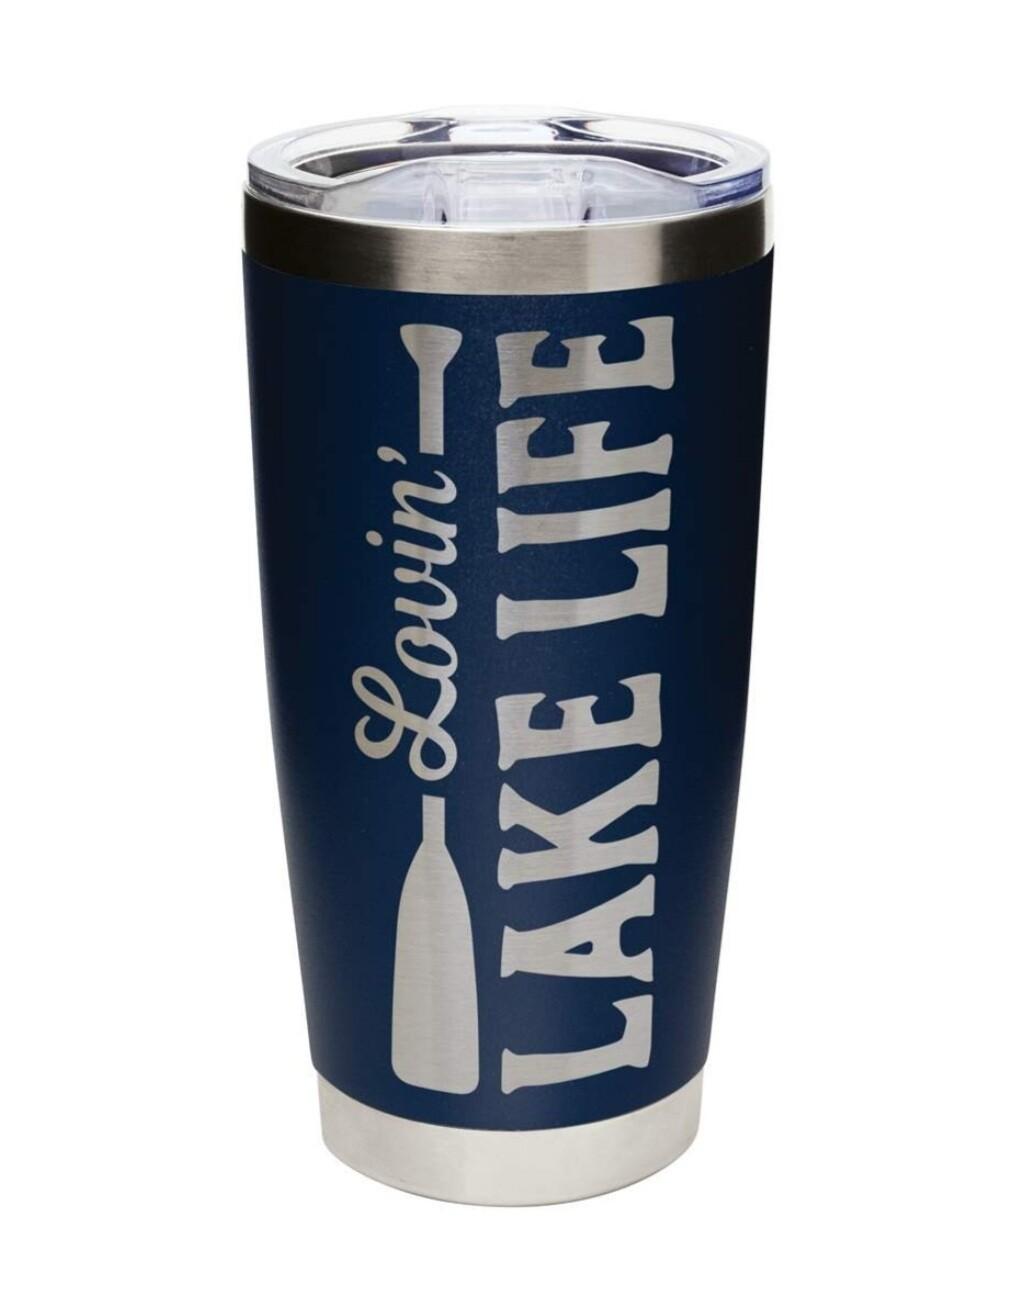 Carson 20oz Stainless Steel Tumbler - Lovin' Lake Life